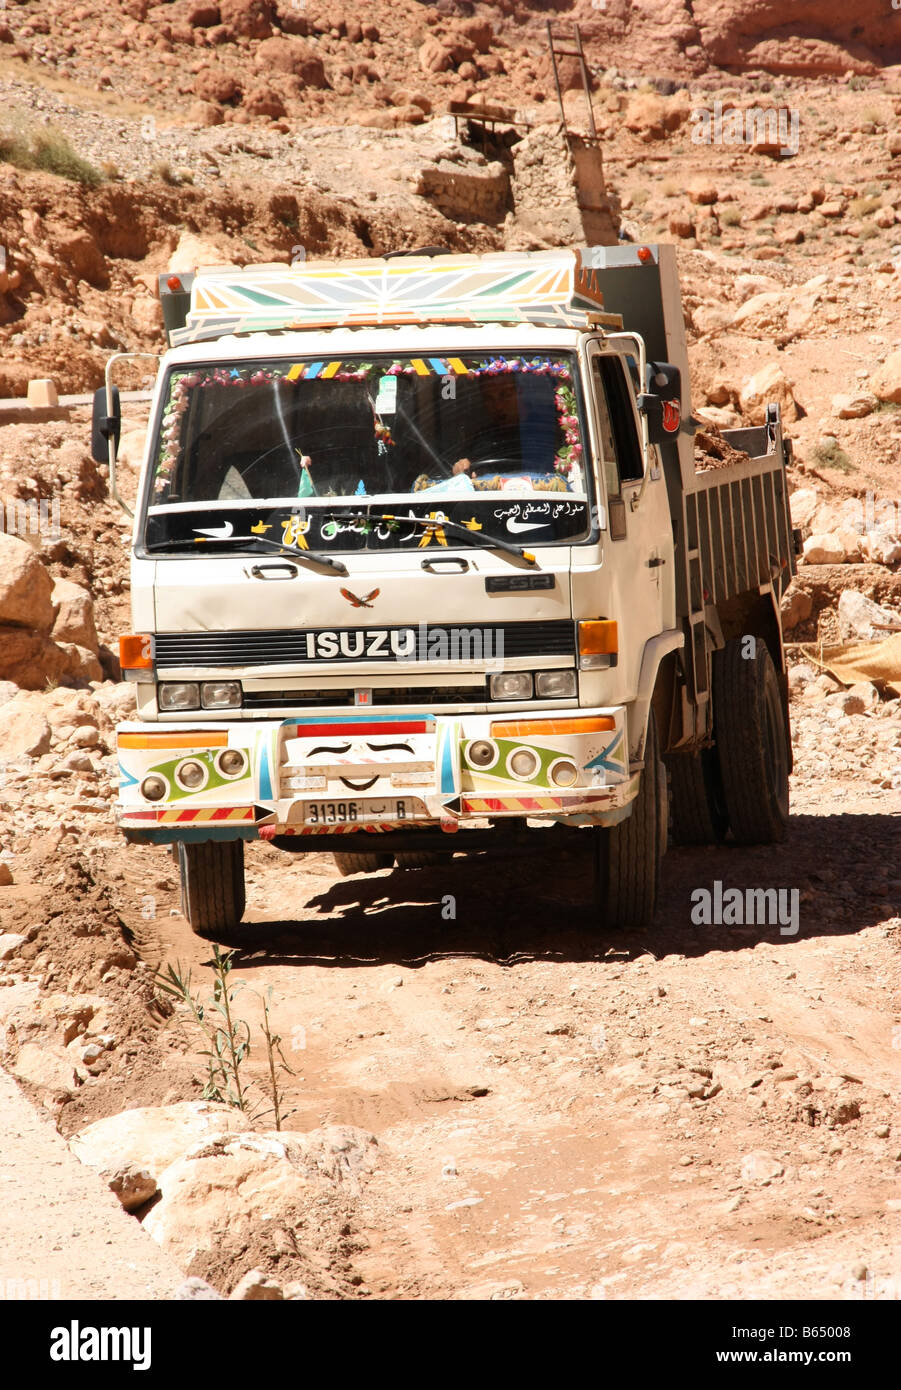 Isuzu Truck Stock Photos & Isuzu Truck Stock Images - Alamy